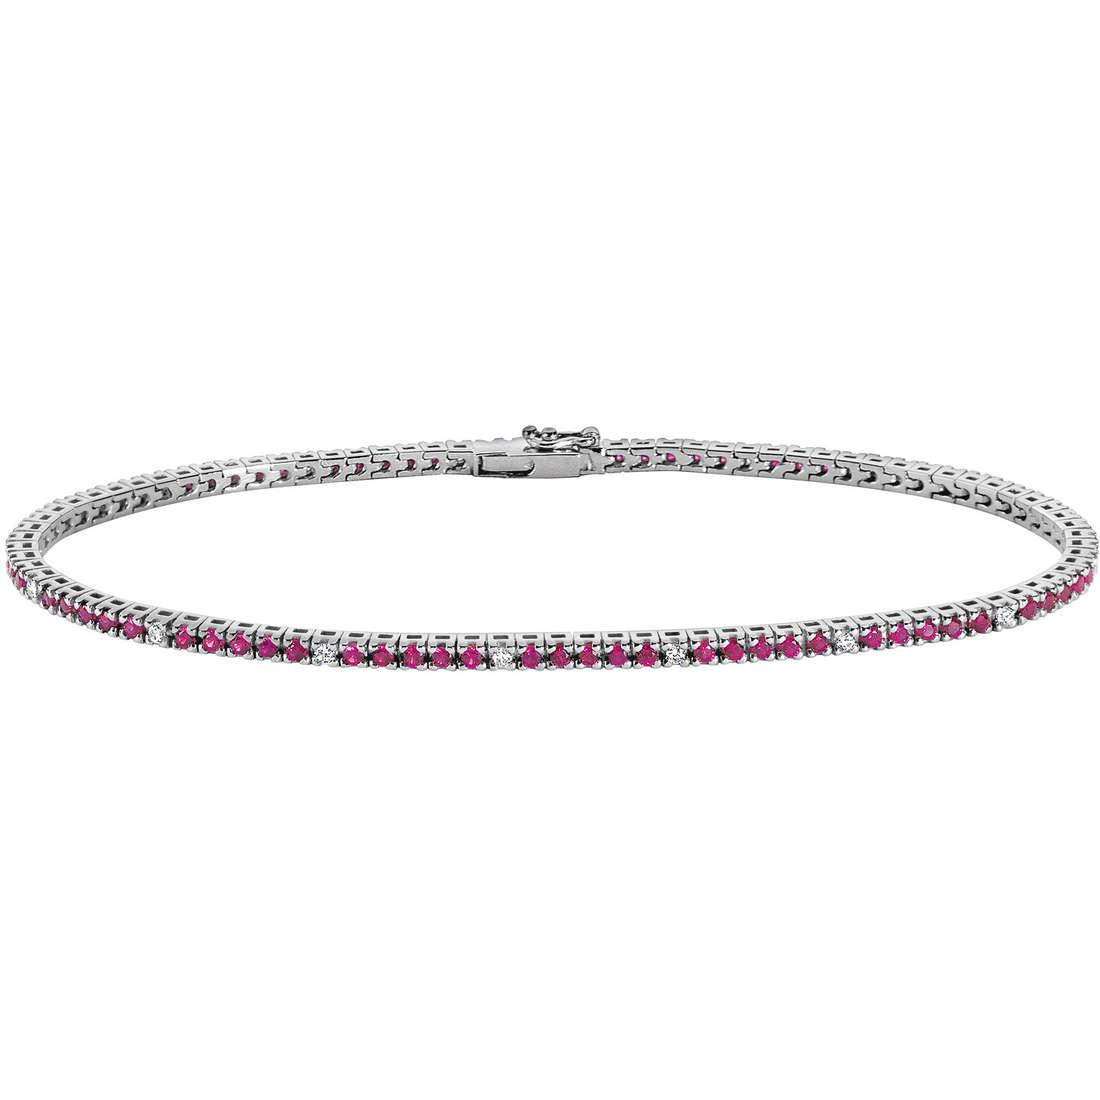 bracelet woman jewellery Comete Pietre preziose colorate BRT 210